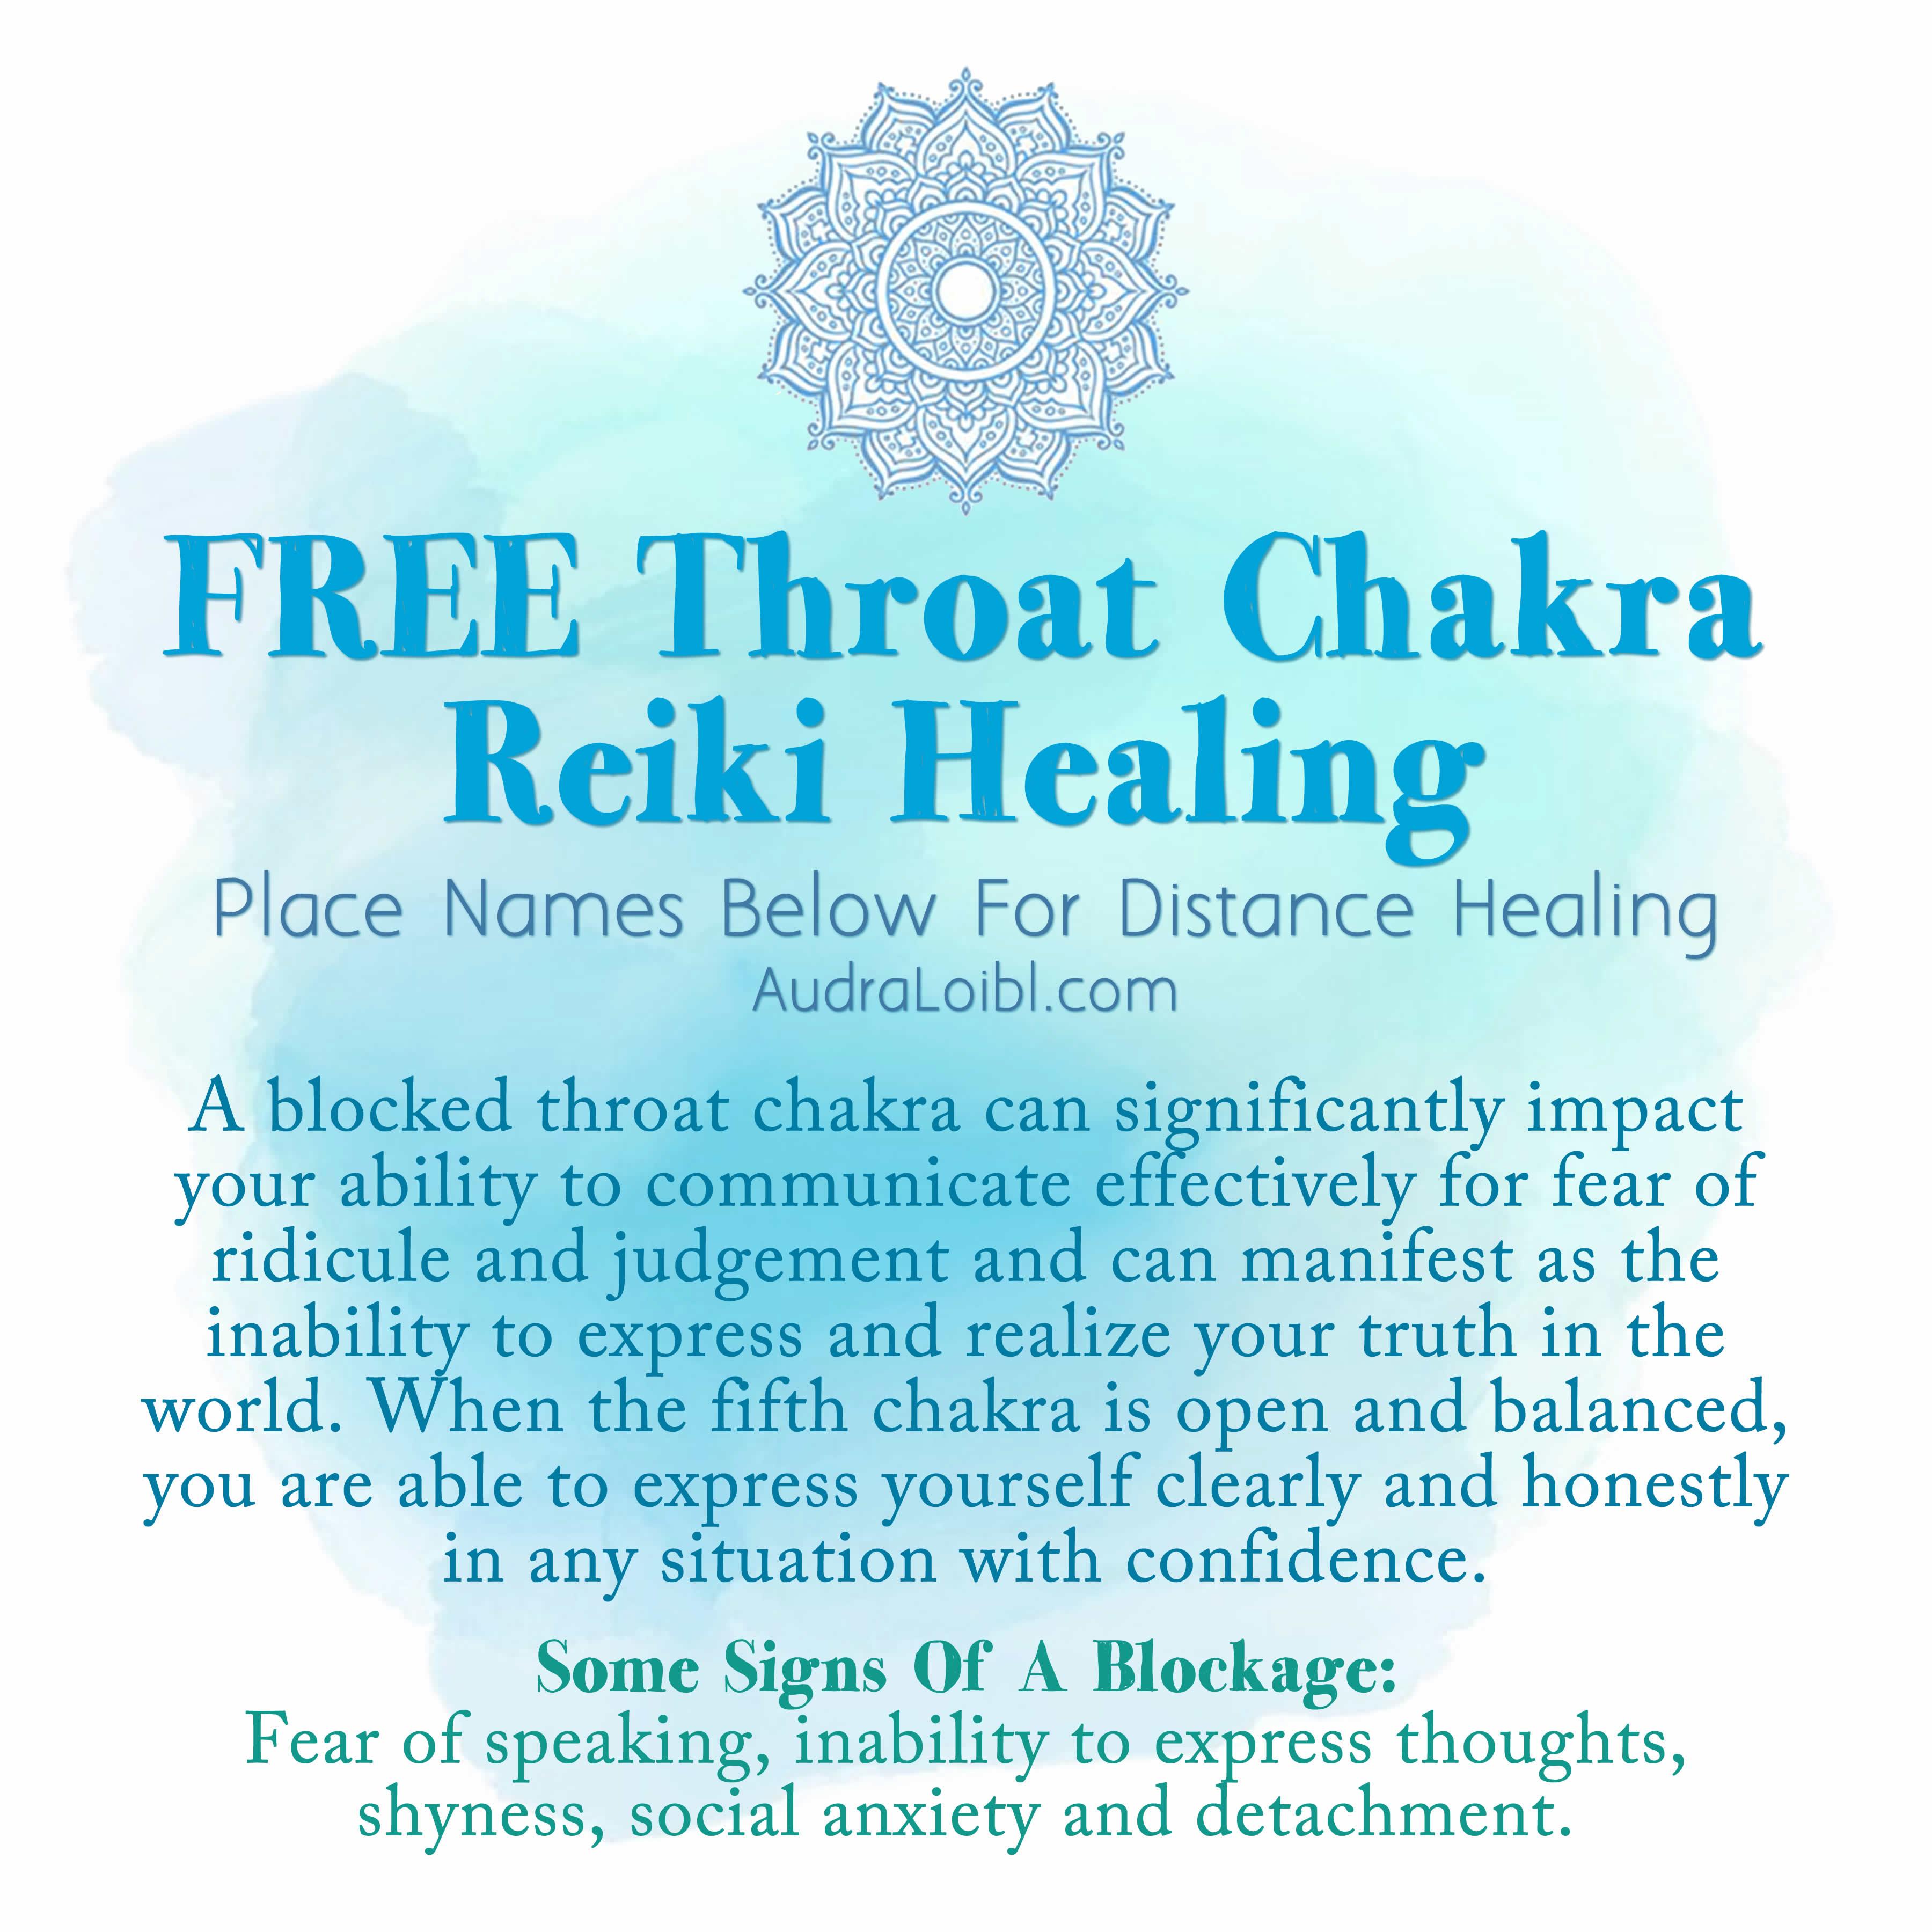 FREE THROAT CHAKRA DISTANCE REIKI HEALING SESSION